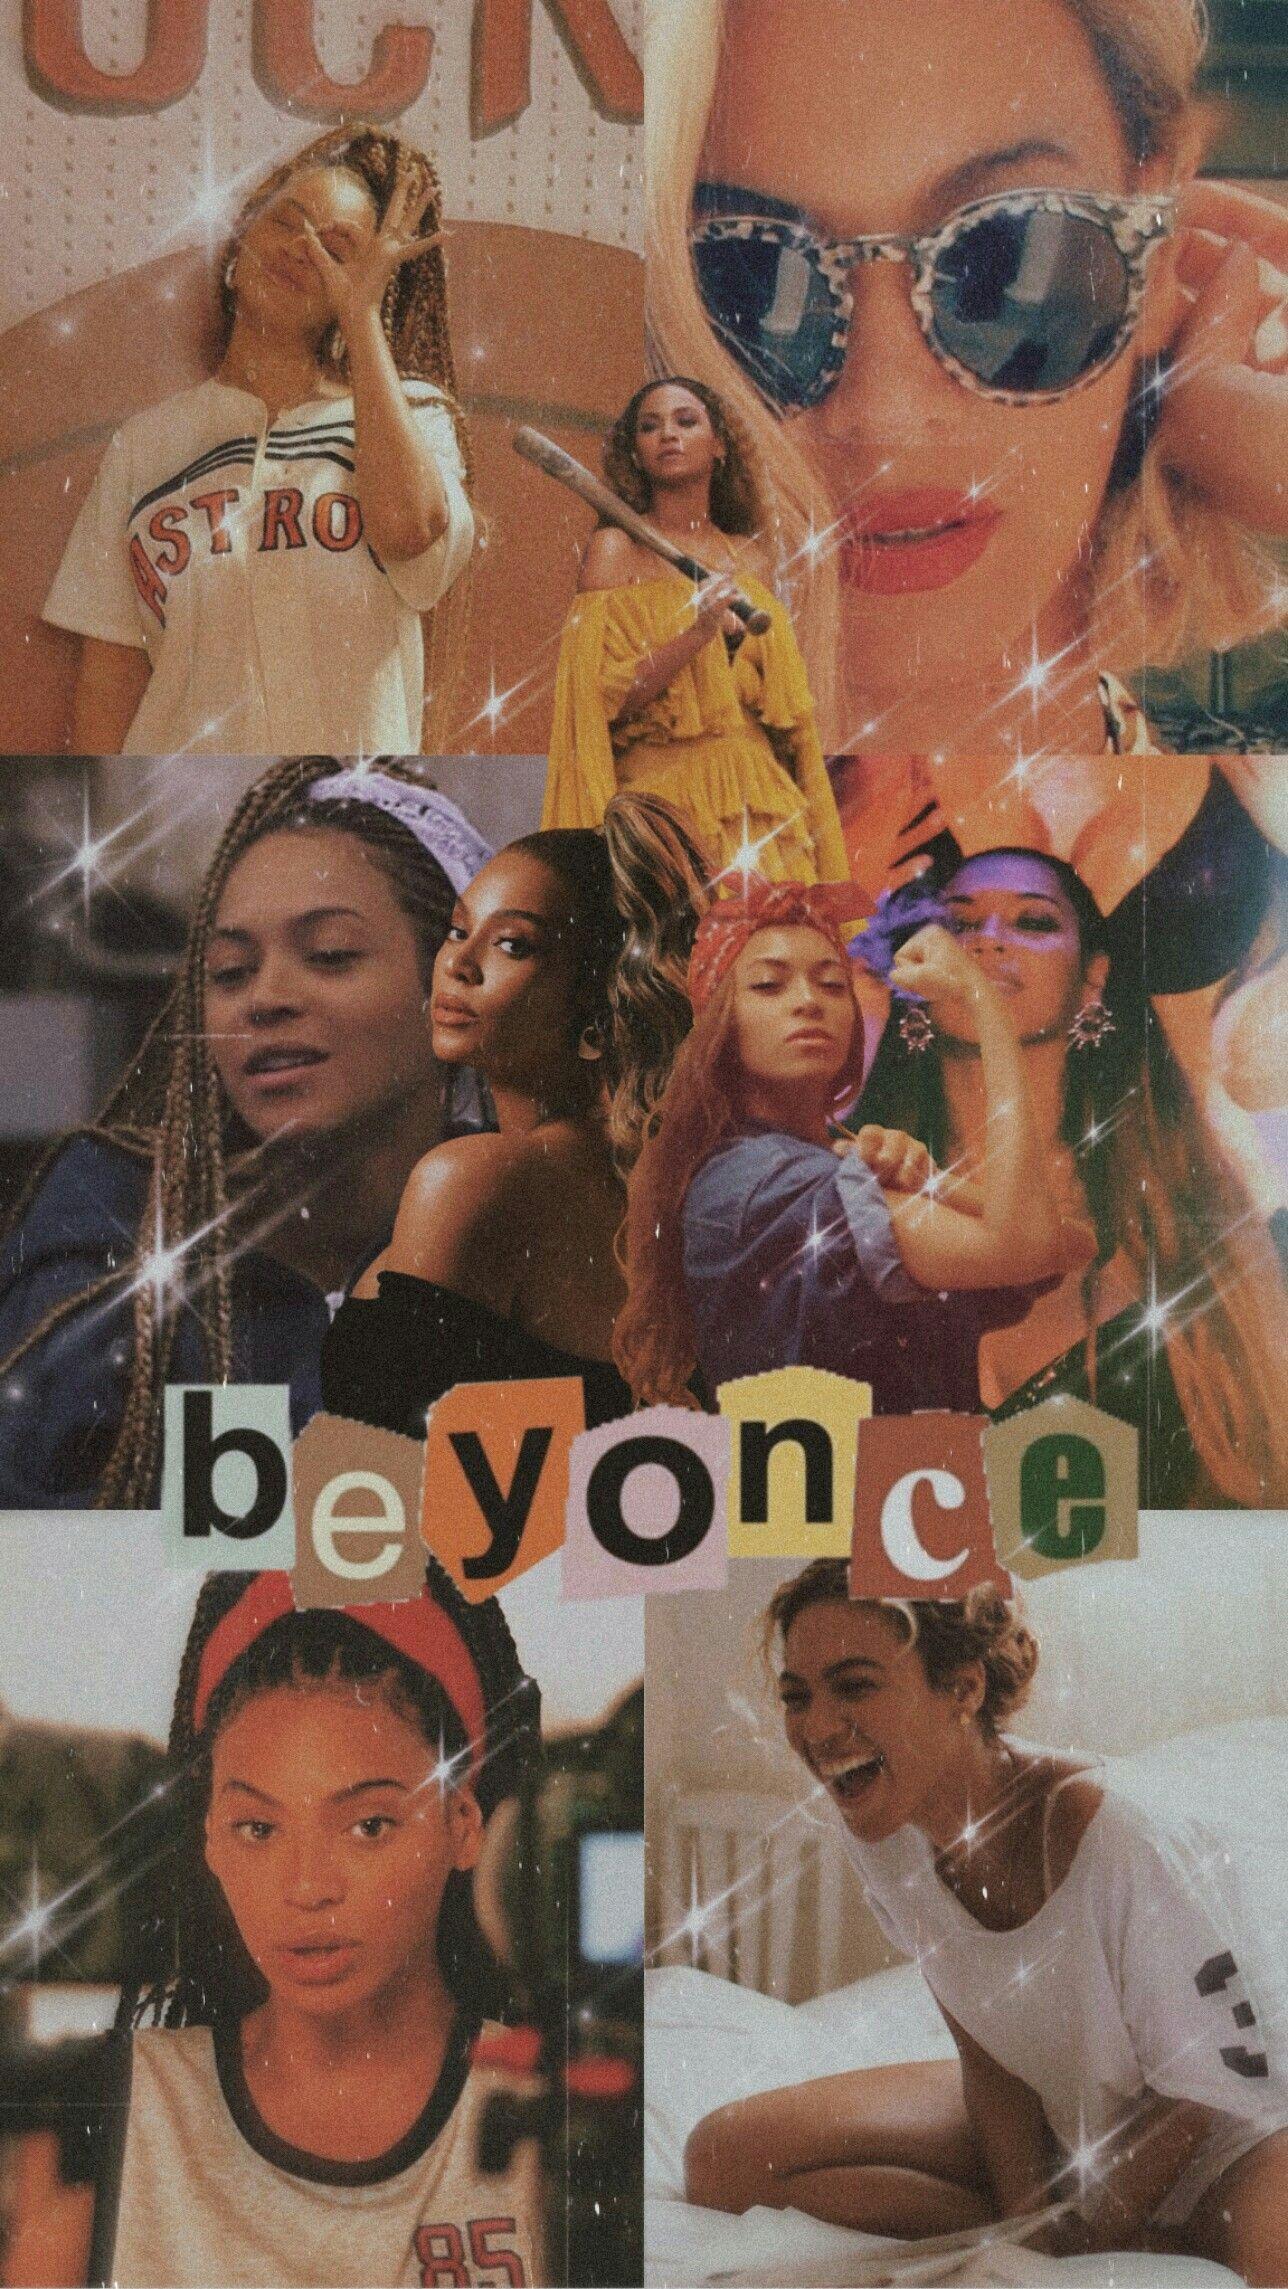 Beyoncé wallpaper in 2020 Edgy wallpaper, Black girl